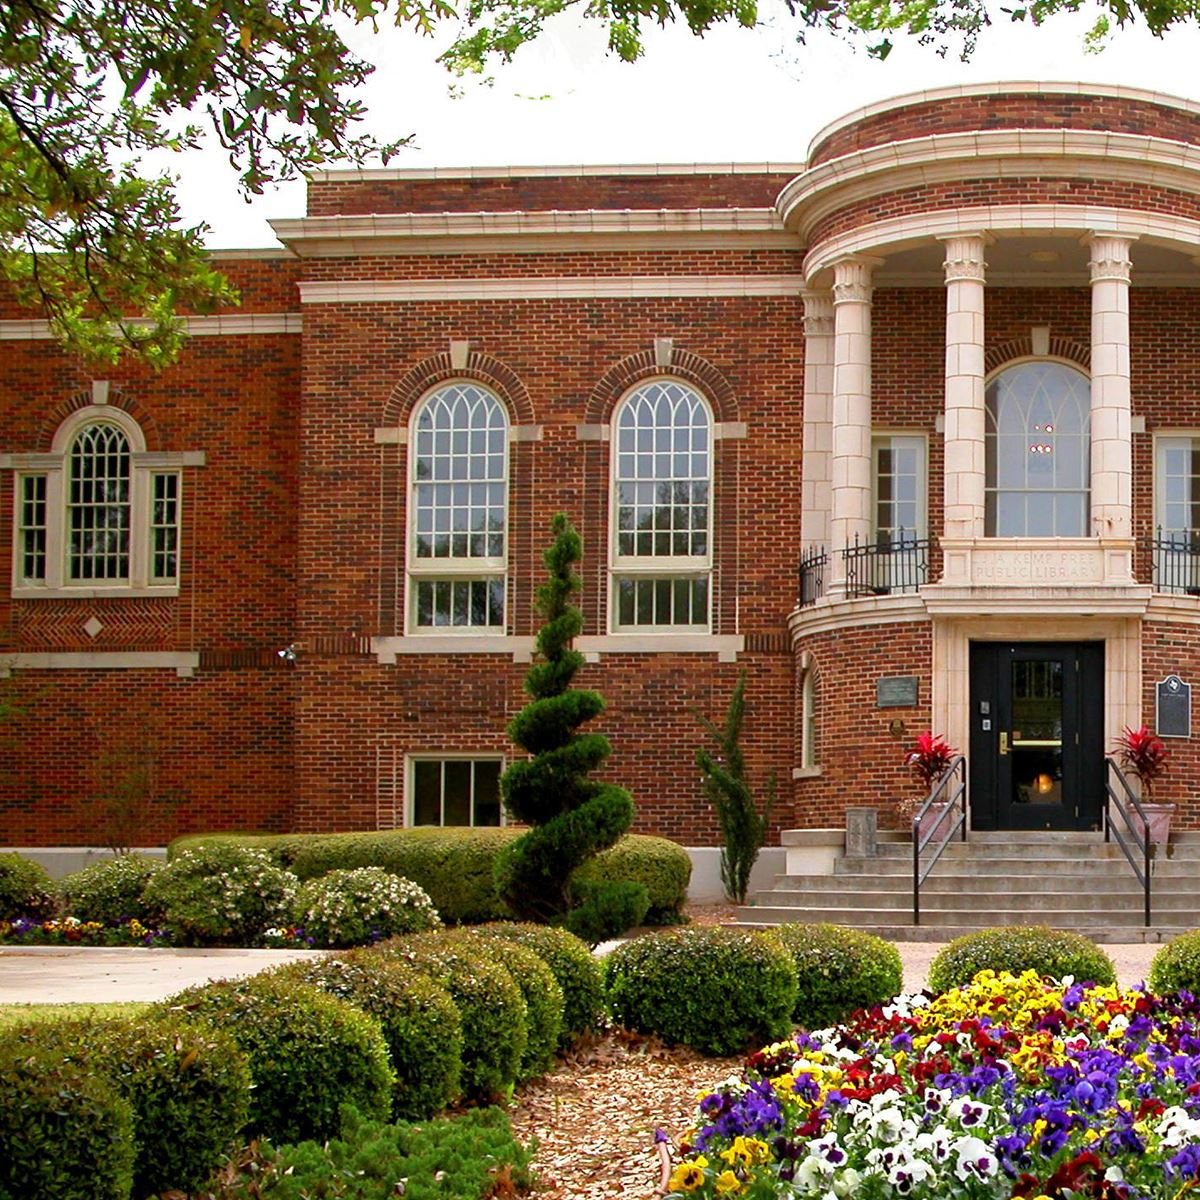 Ford House Wichita Falls Tx >> Wichita Falls Tx Official Website Official Website